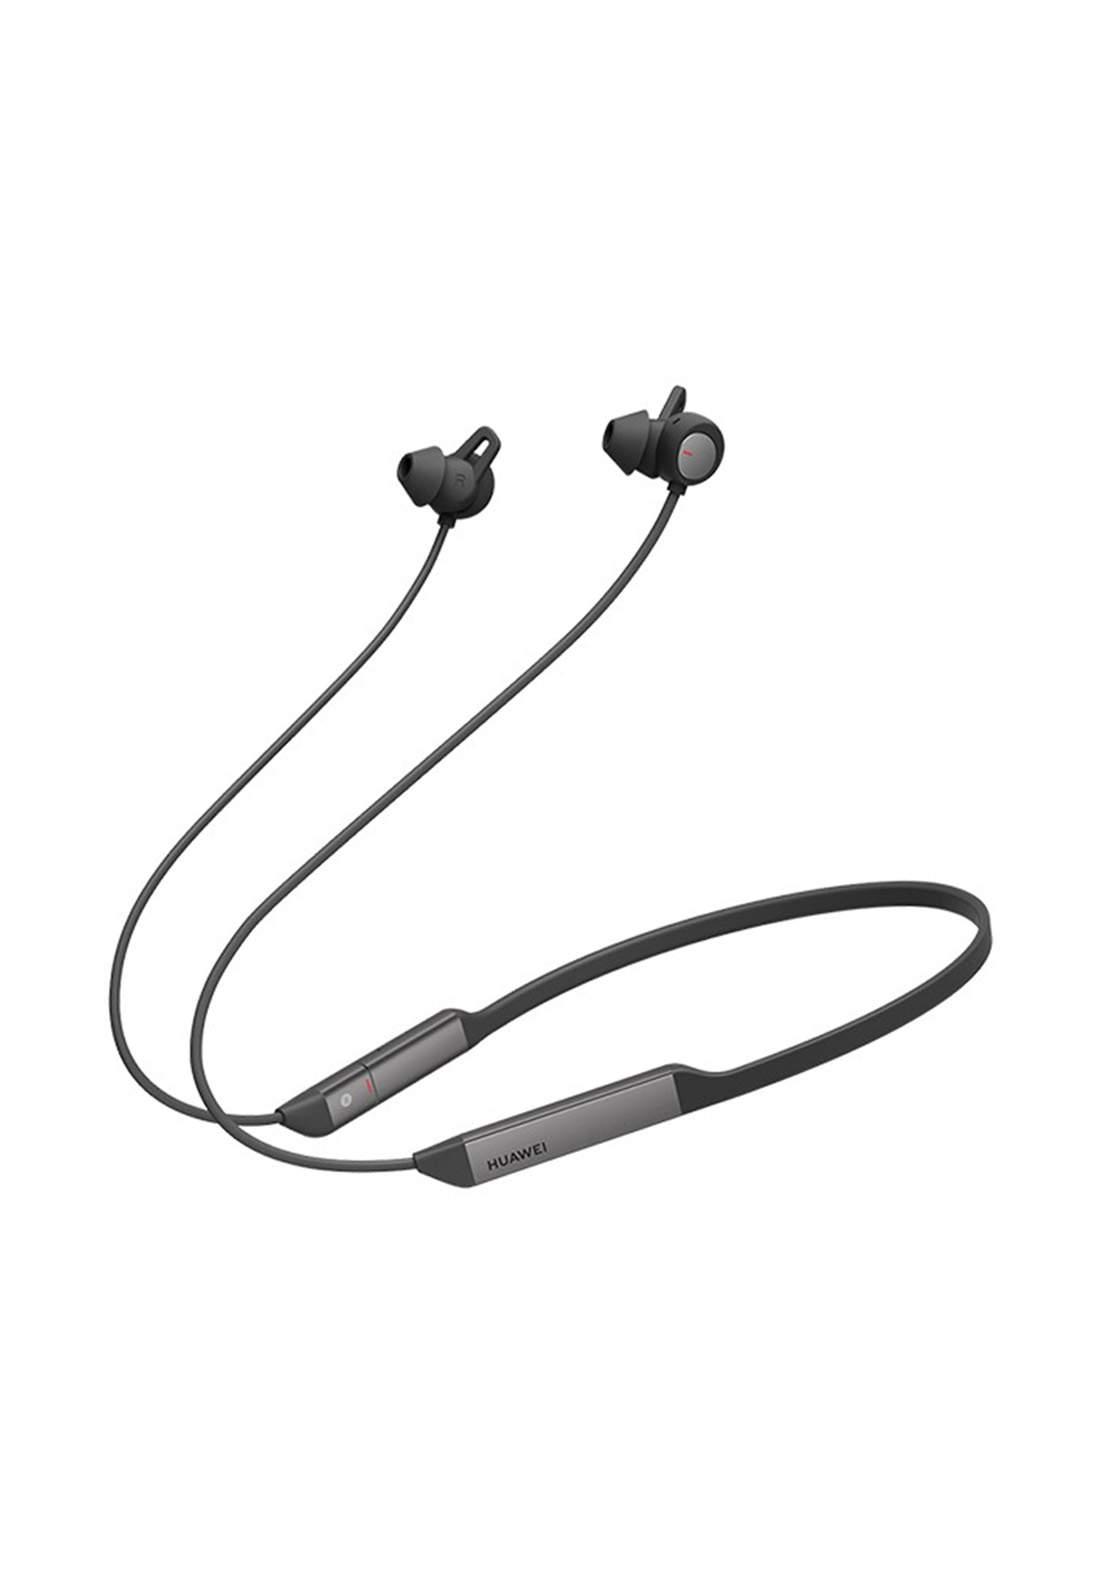 Huawei FreeLace Pro Bluetooth Headphone- Black سماعة لاسلكية